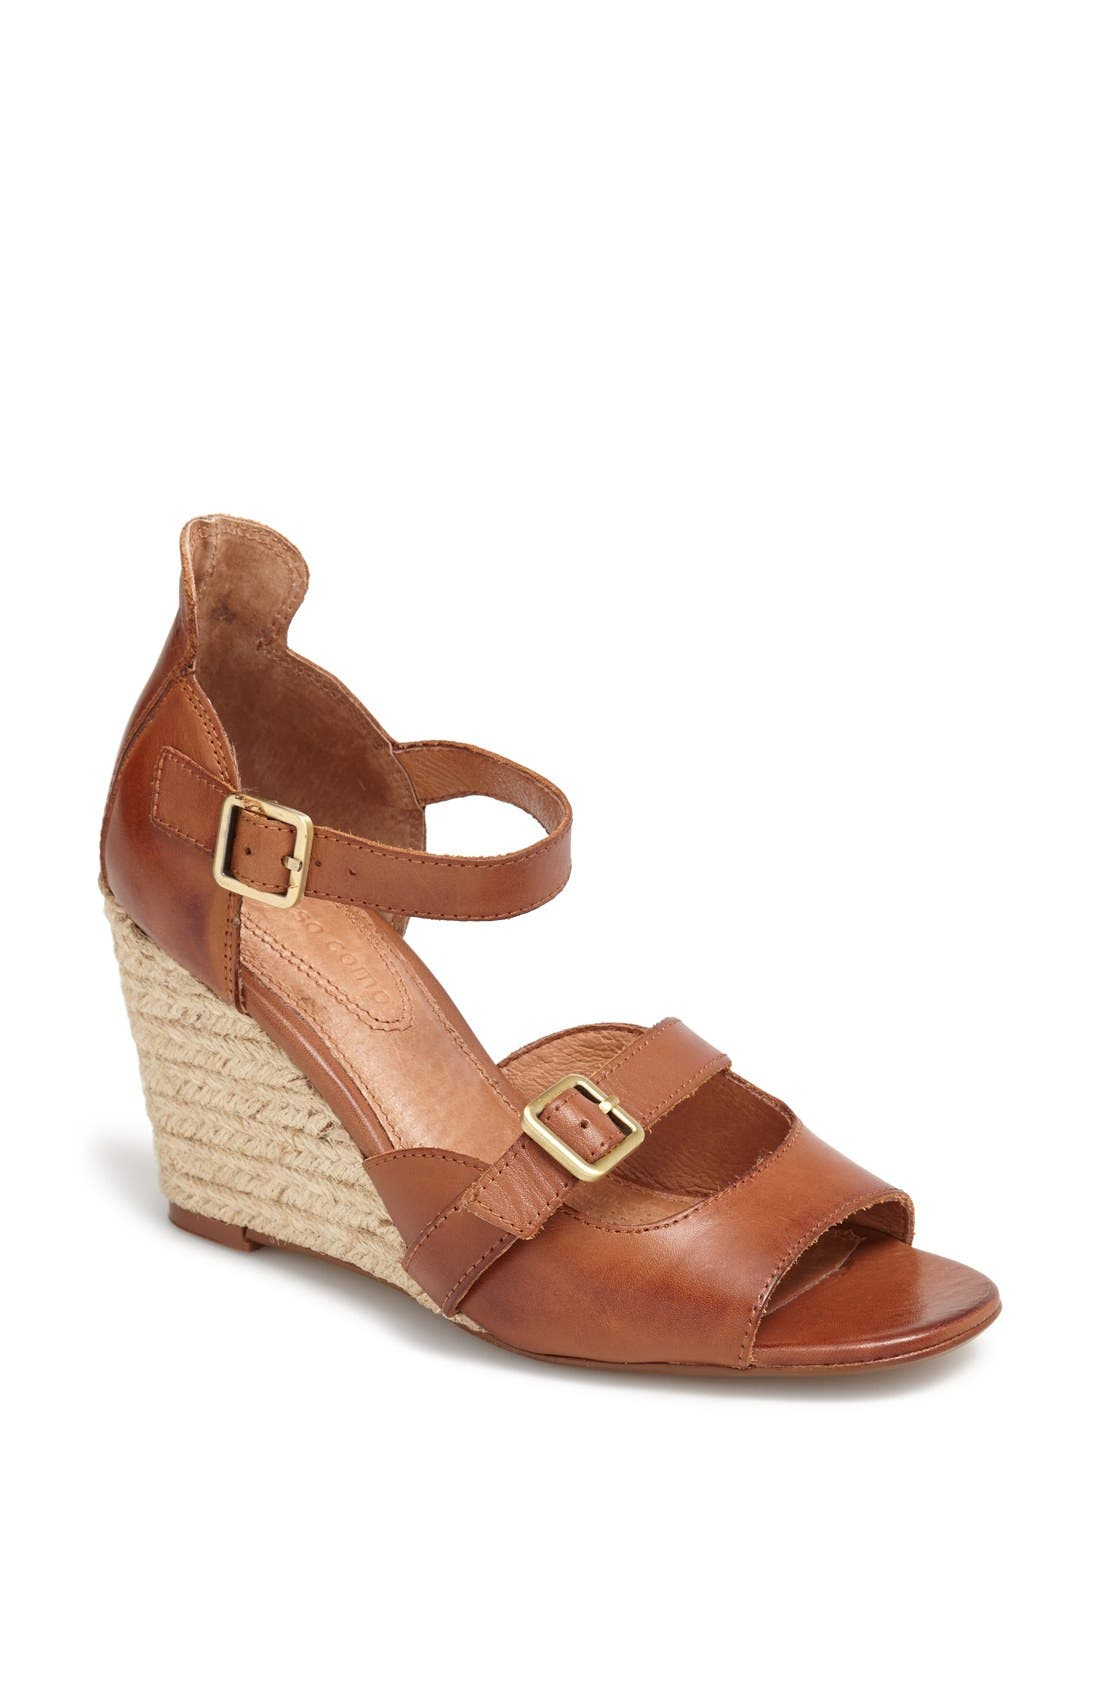 Main Image - Corso Como 'Hello' Calfskin Leather Sandal